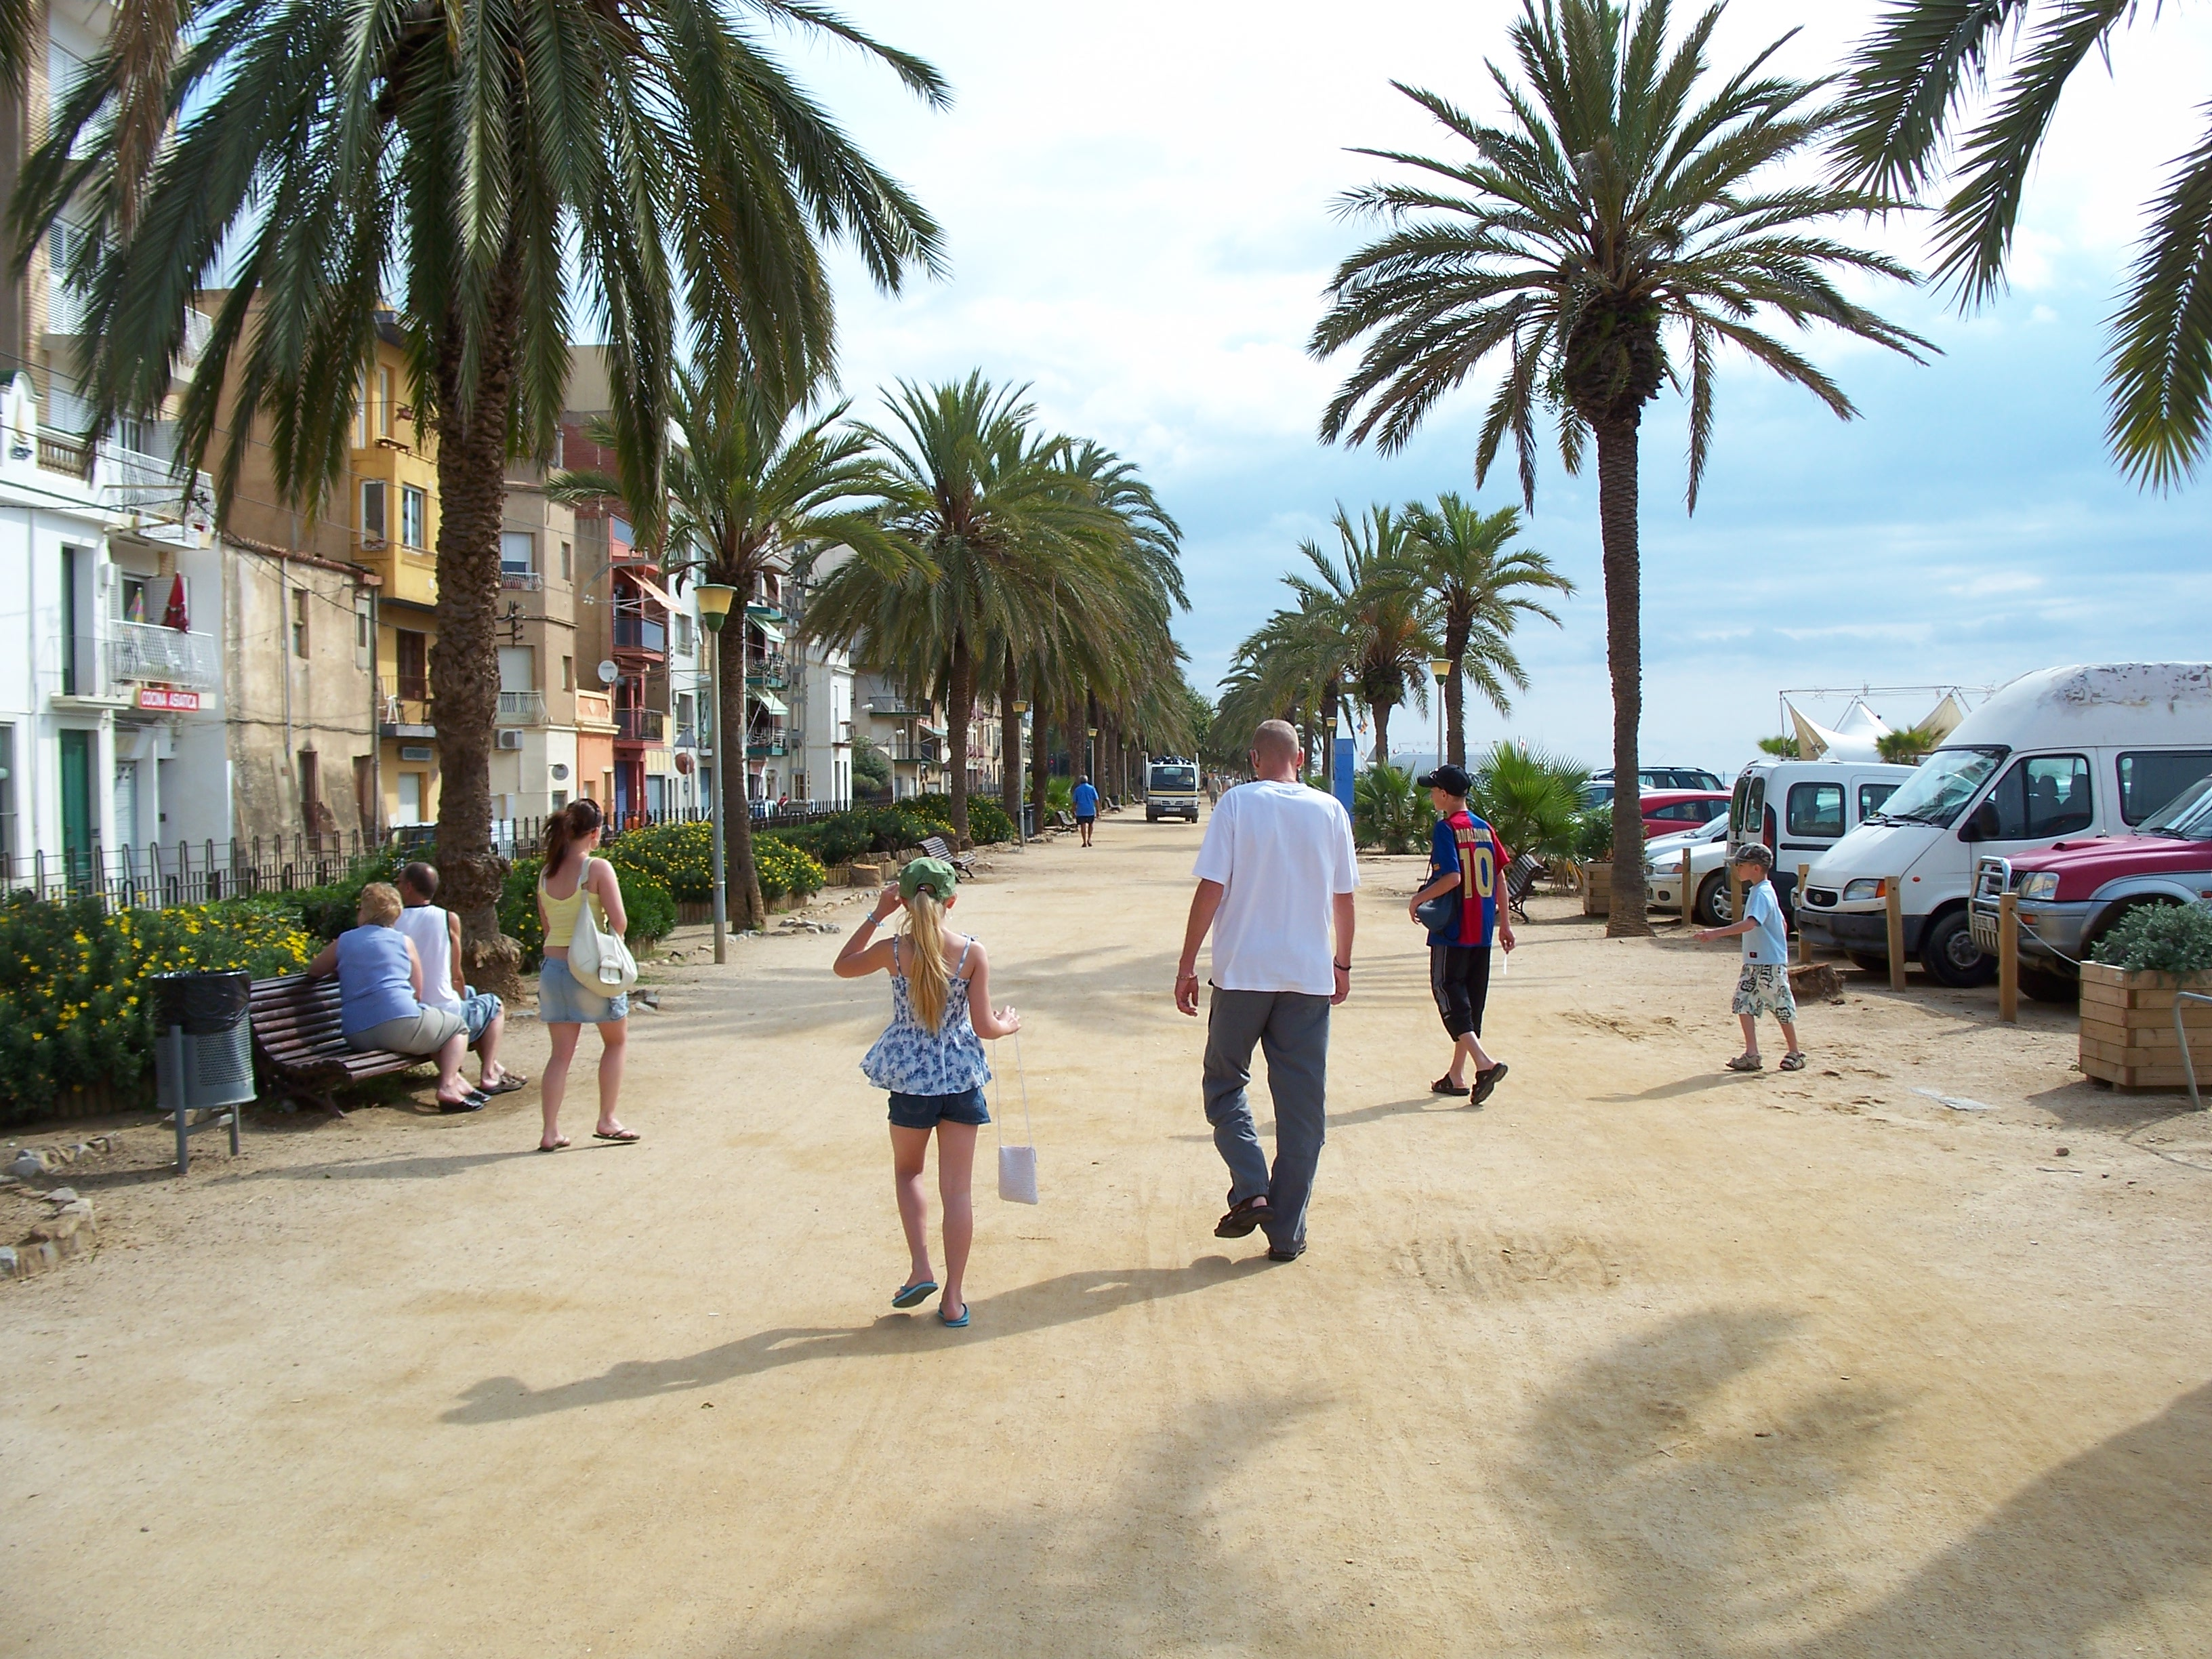 Foto playa Les Roques. Calella,Costa brava/August 2007